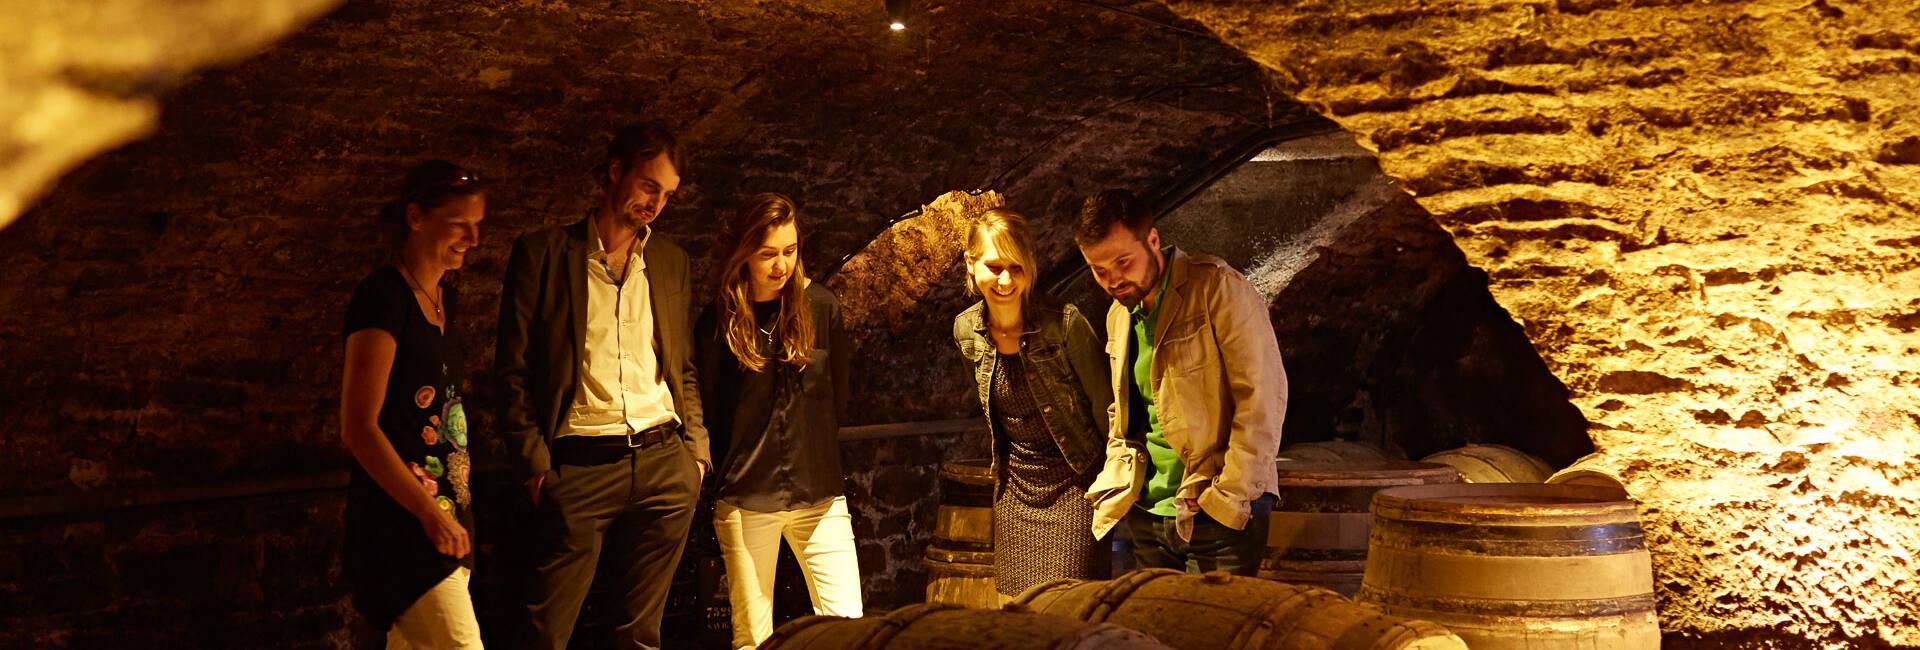 Cellars and wineries in Beaune Region © Studio Piffaut